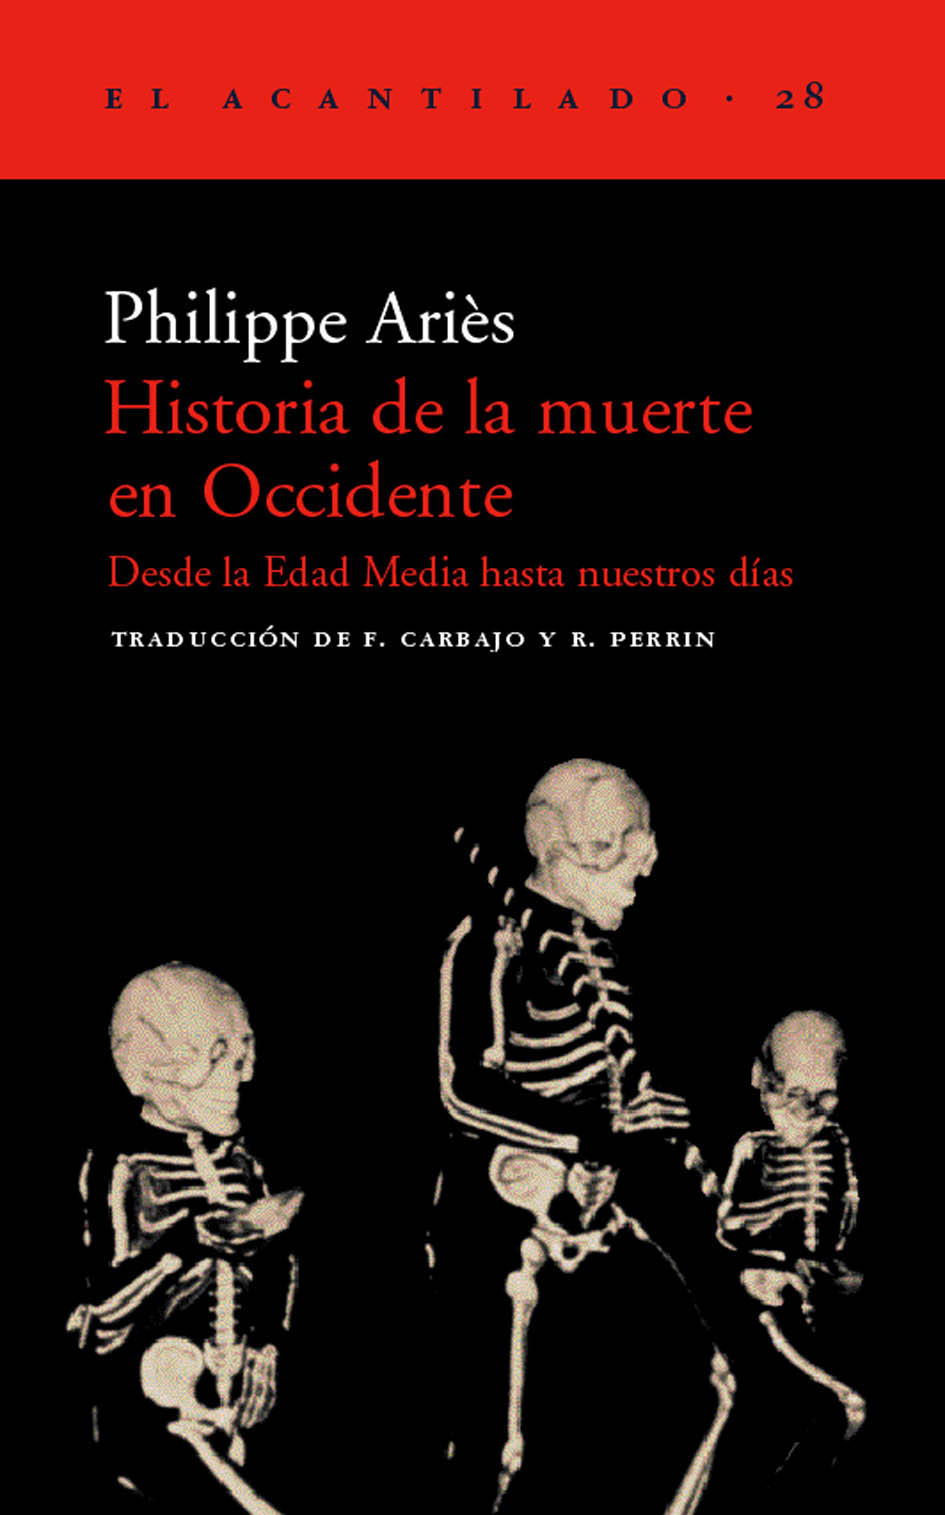 philippe aries historia de la muerte en occidente pdf